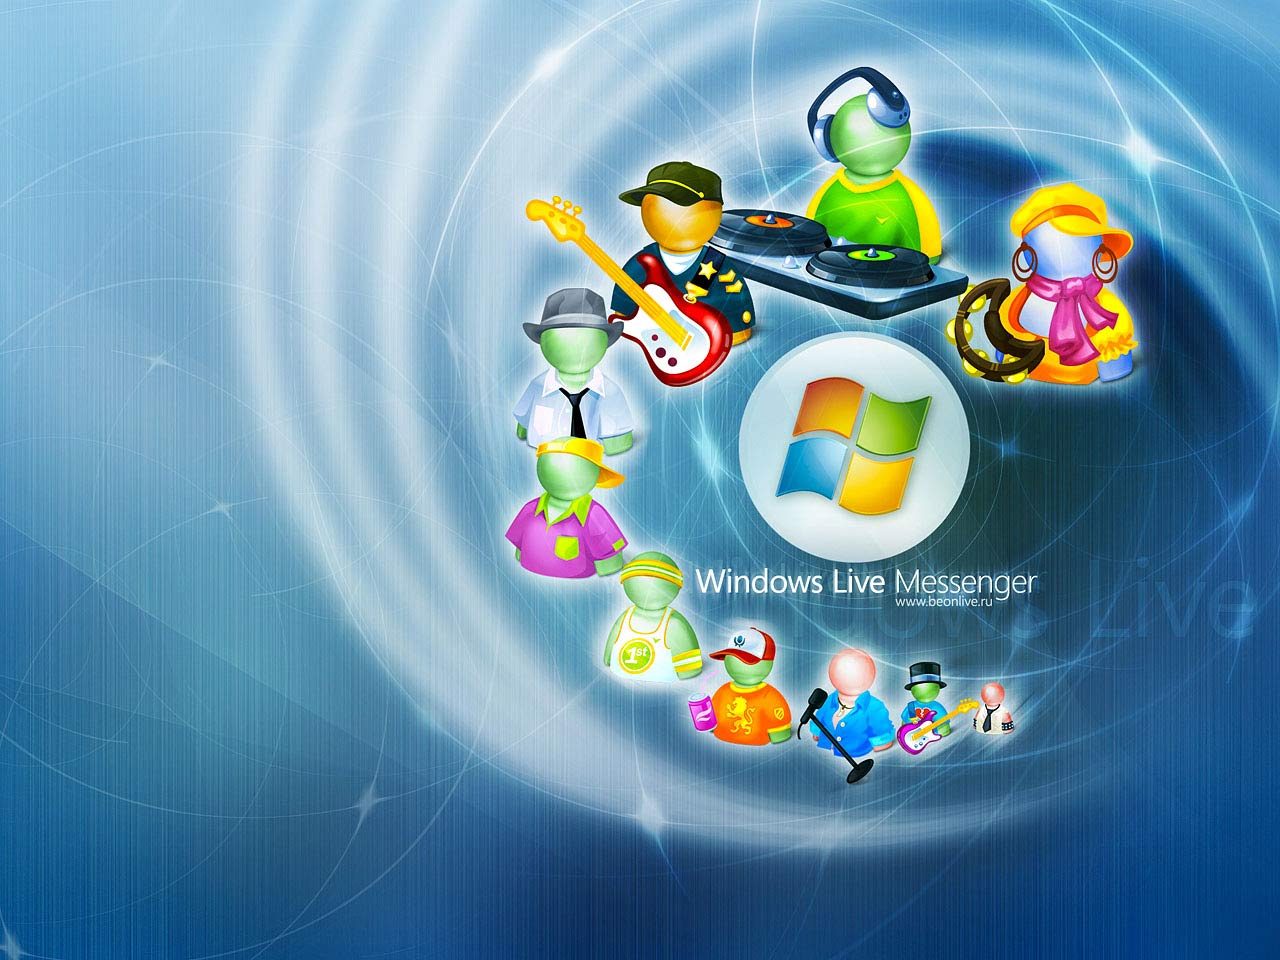 http://4.bp.blogspot.com/-fKQpsFmUH_o/Tt8PskBfFCI/AAAAAAAAHWU/ktzBlLReZhM/s1600/premium+windows+wallpaper+%25281%2529.jpg